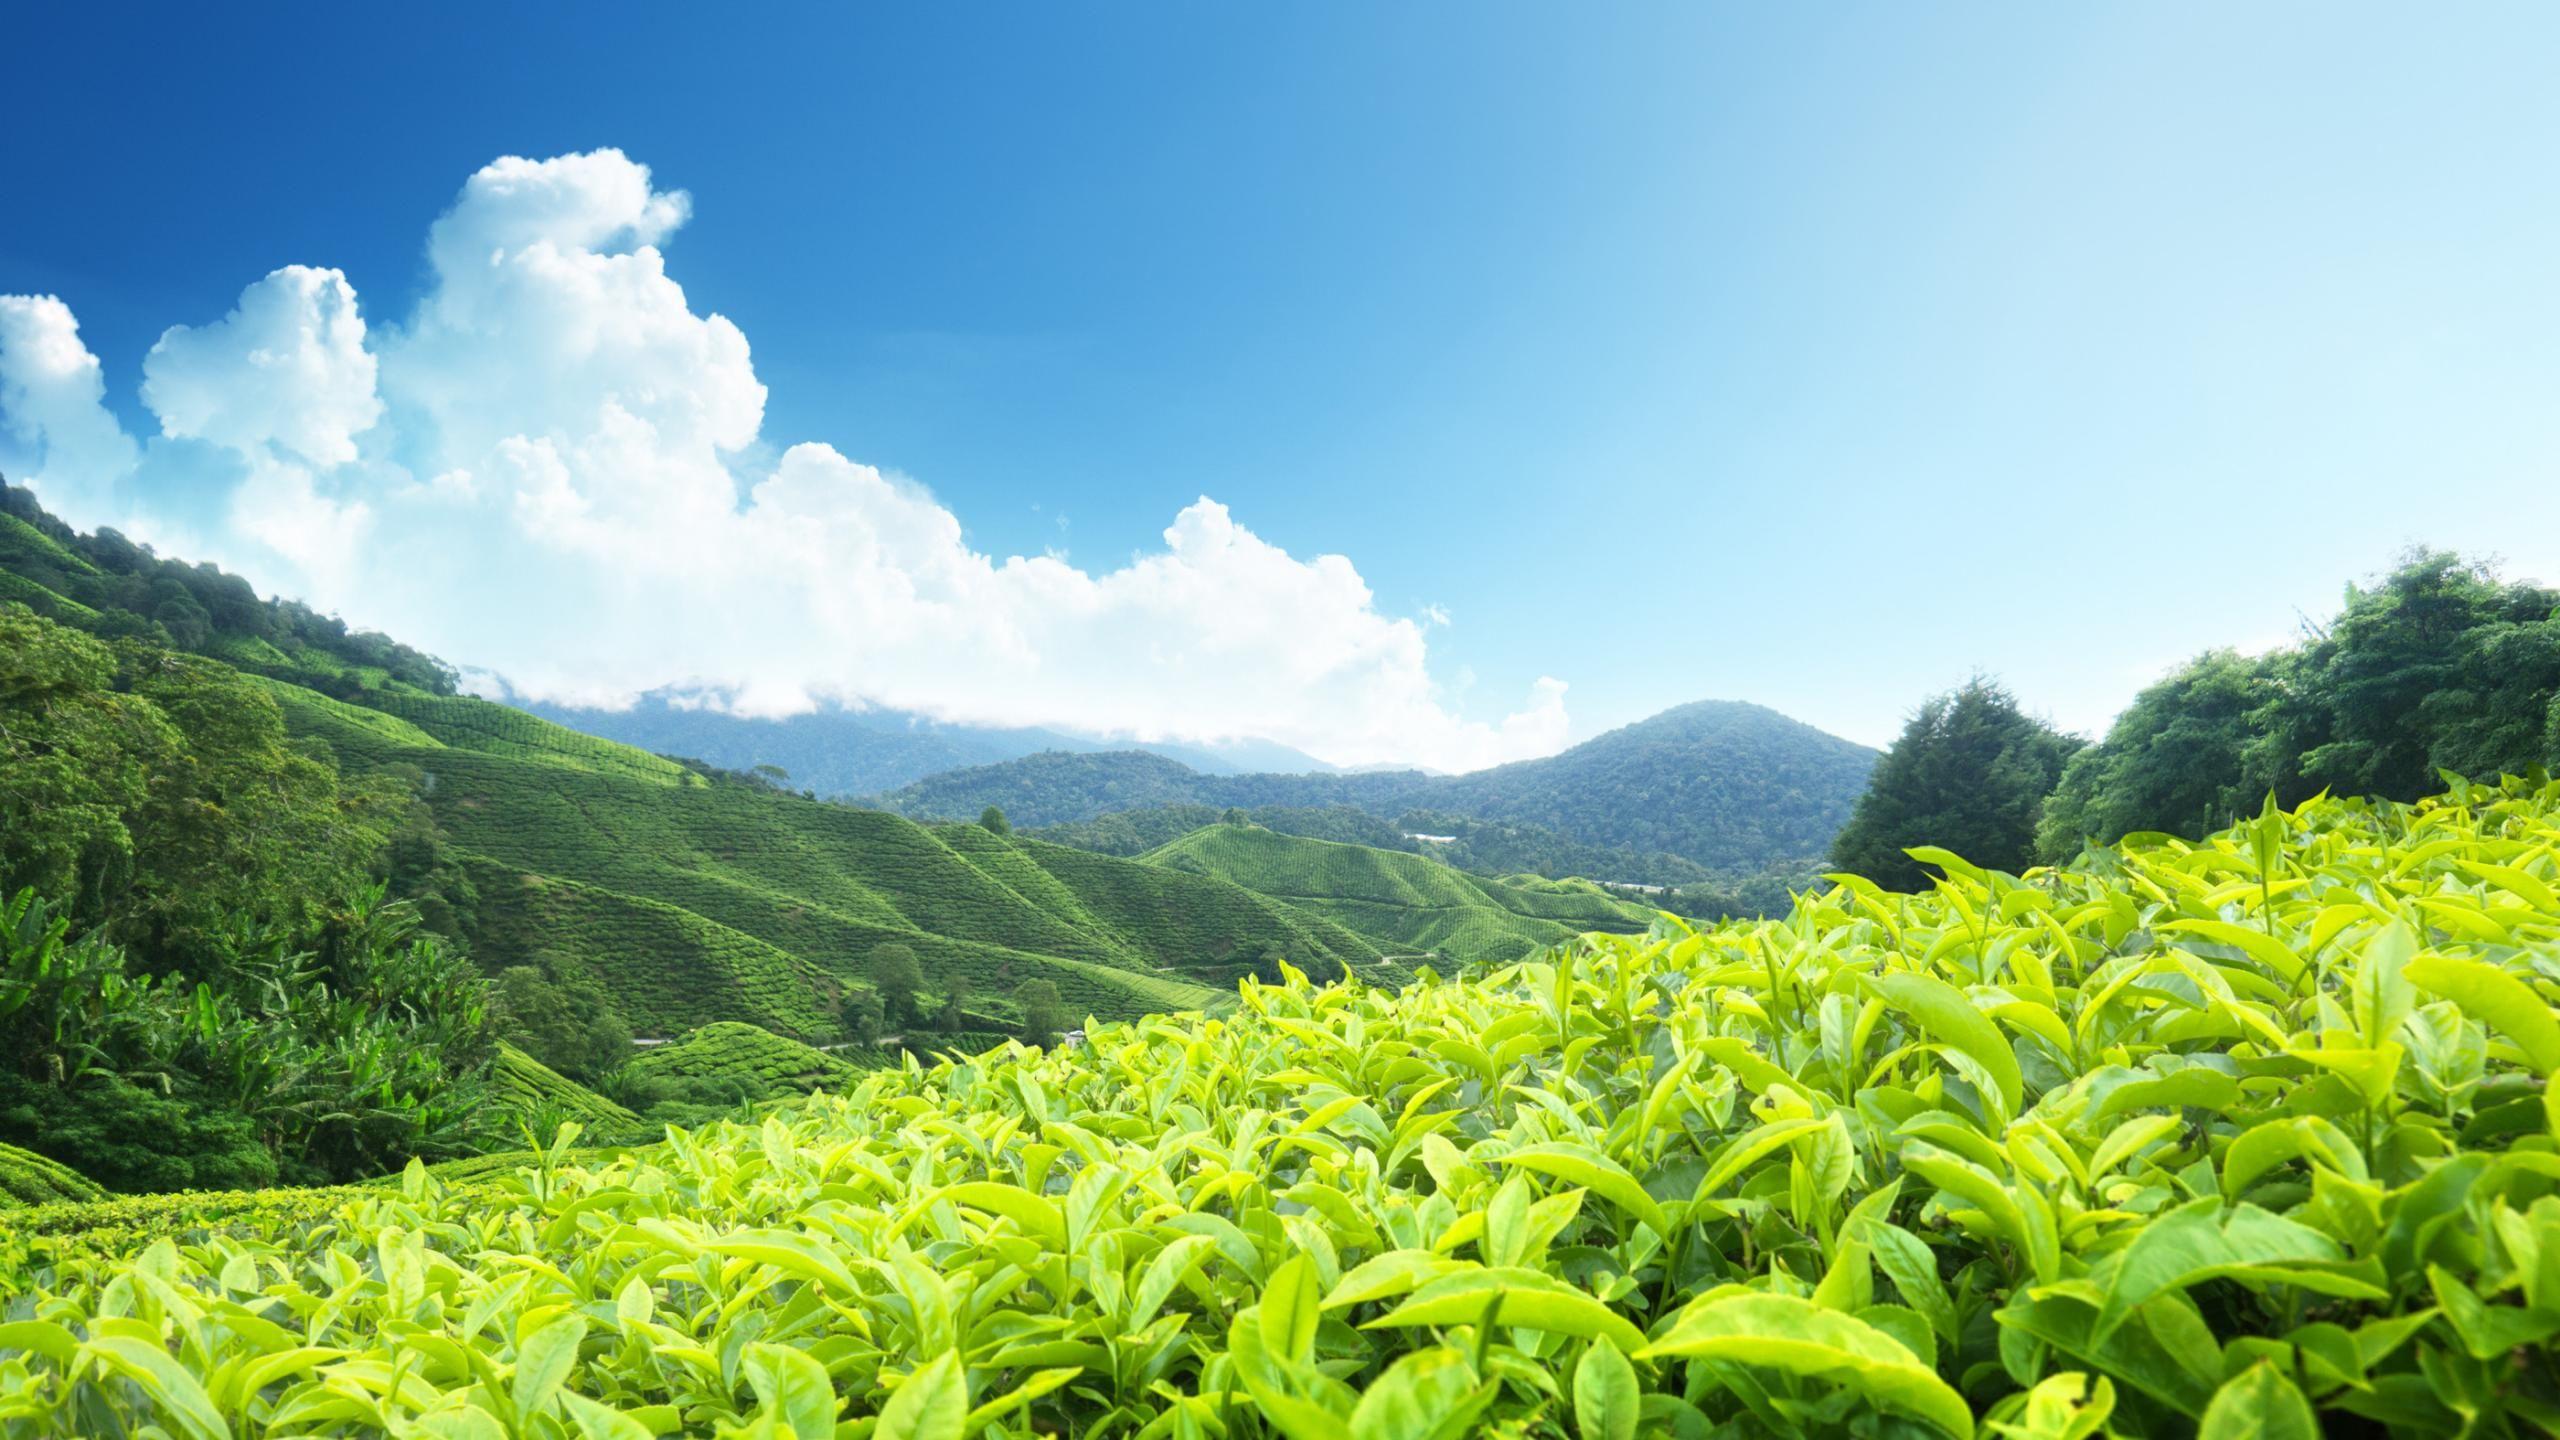 Find out: Tea Hills wallpaper on http://hdpicorner.com/tea-hills ...